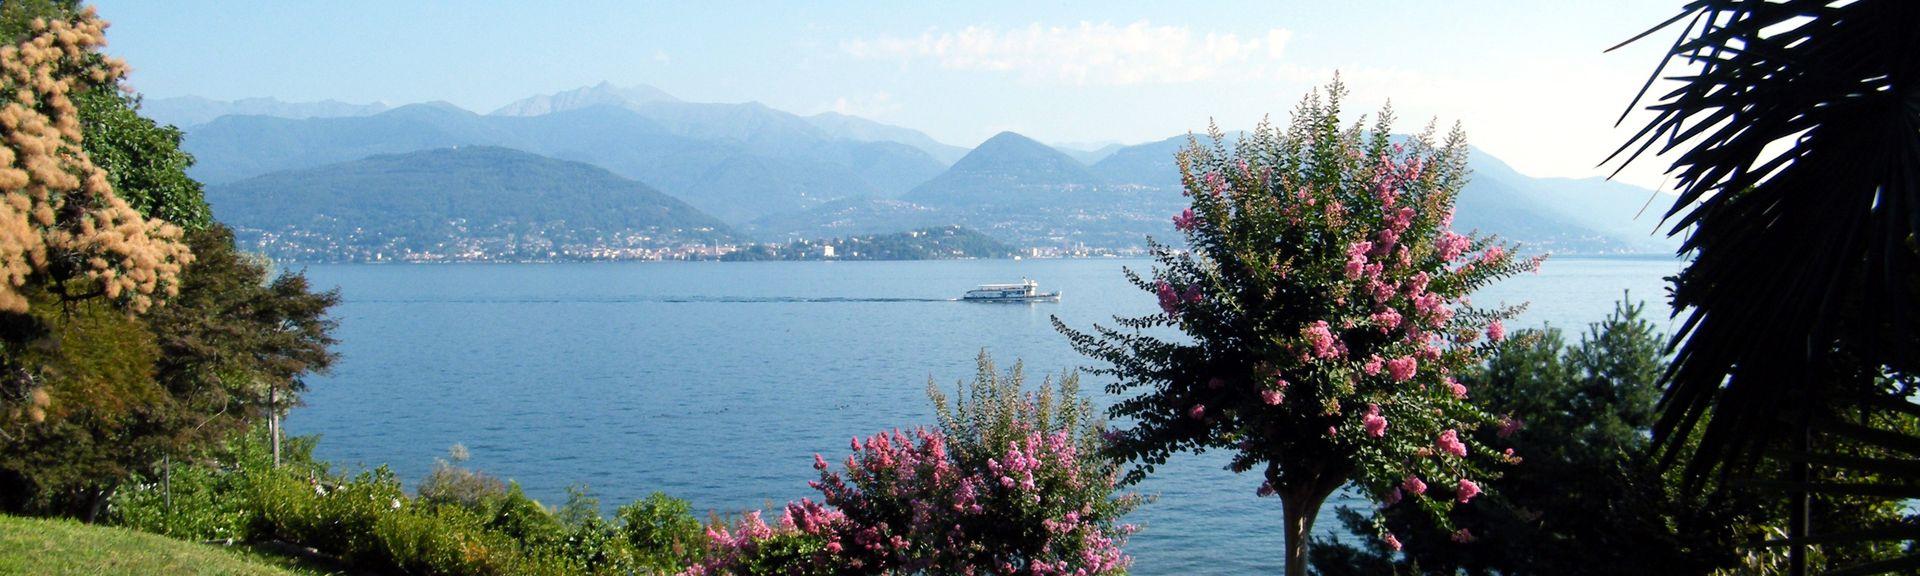 Località Tre Ponti, Verbano-Cusio-Ossola, Piedmont, Italy